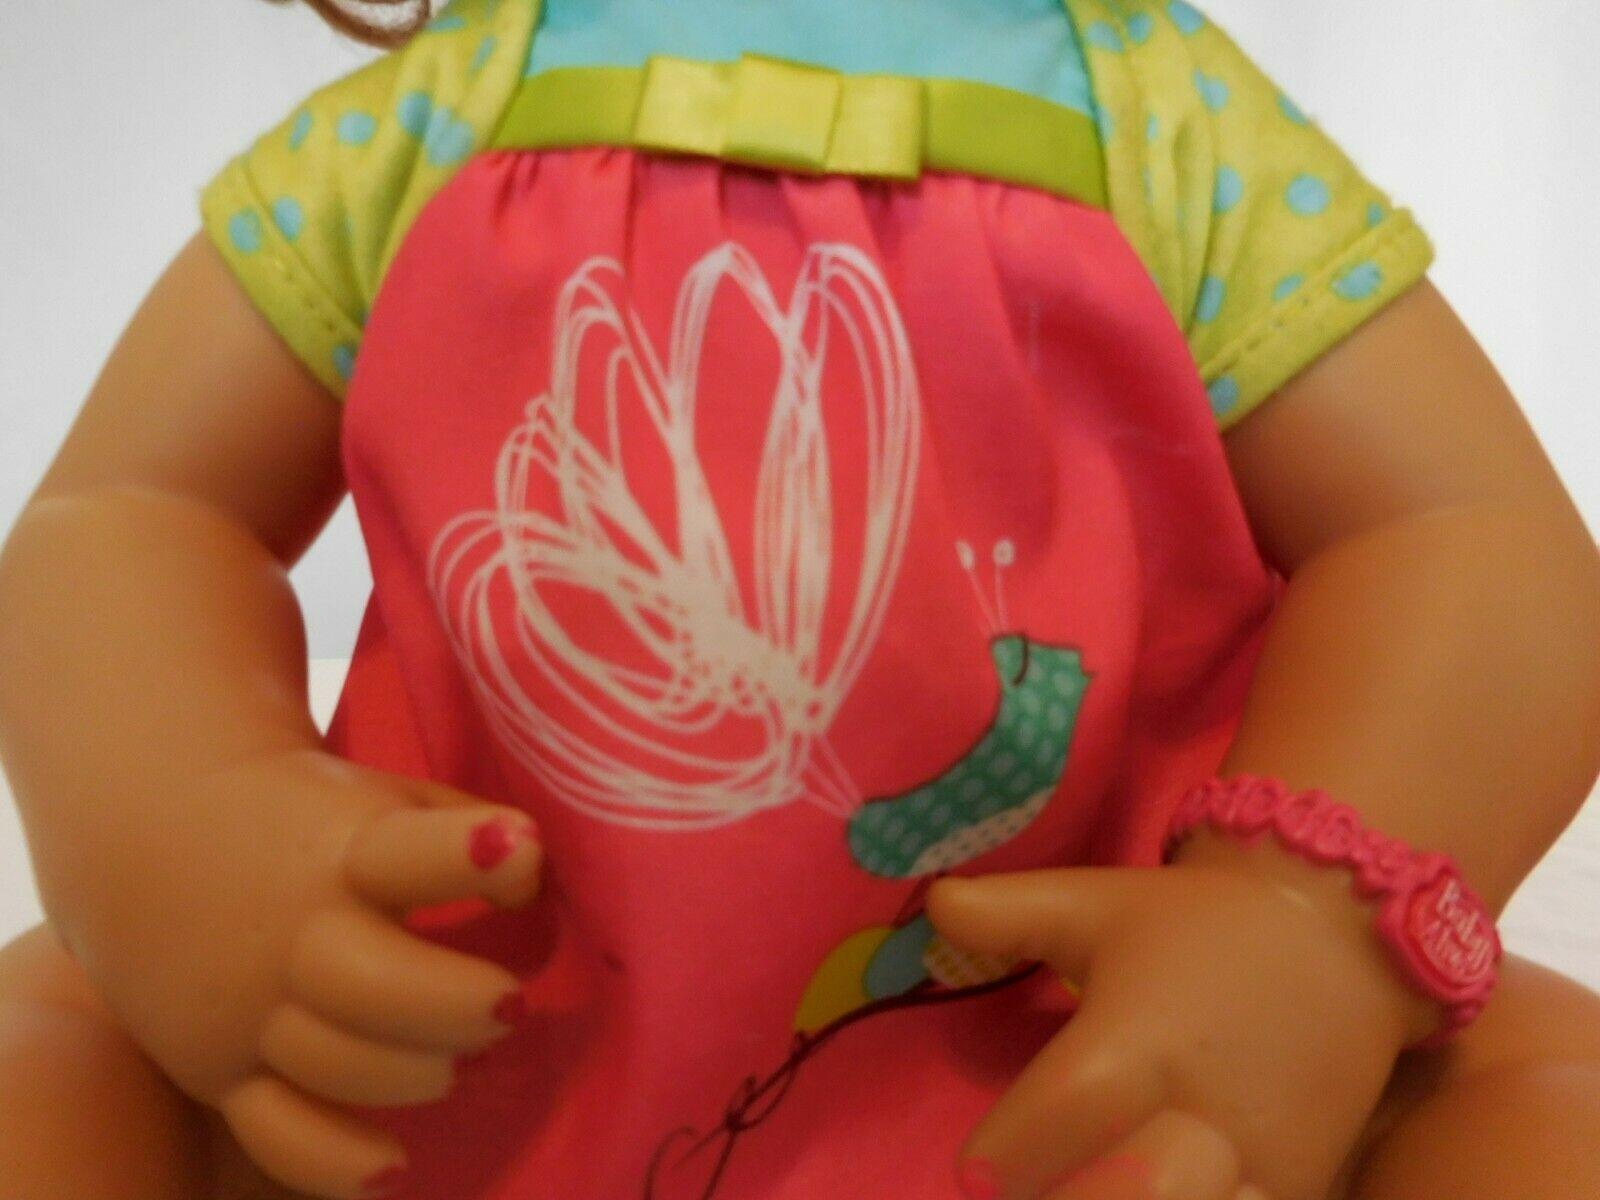 Baby Alive Hispanic Interactive Doll Eats & Poops + Yummy Treats Licks Ice Cream image 2